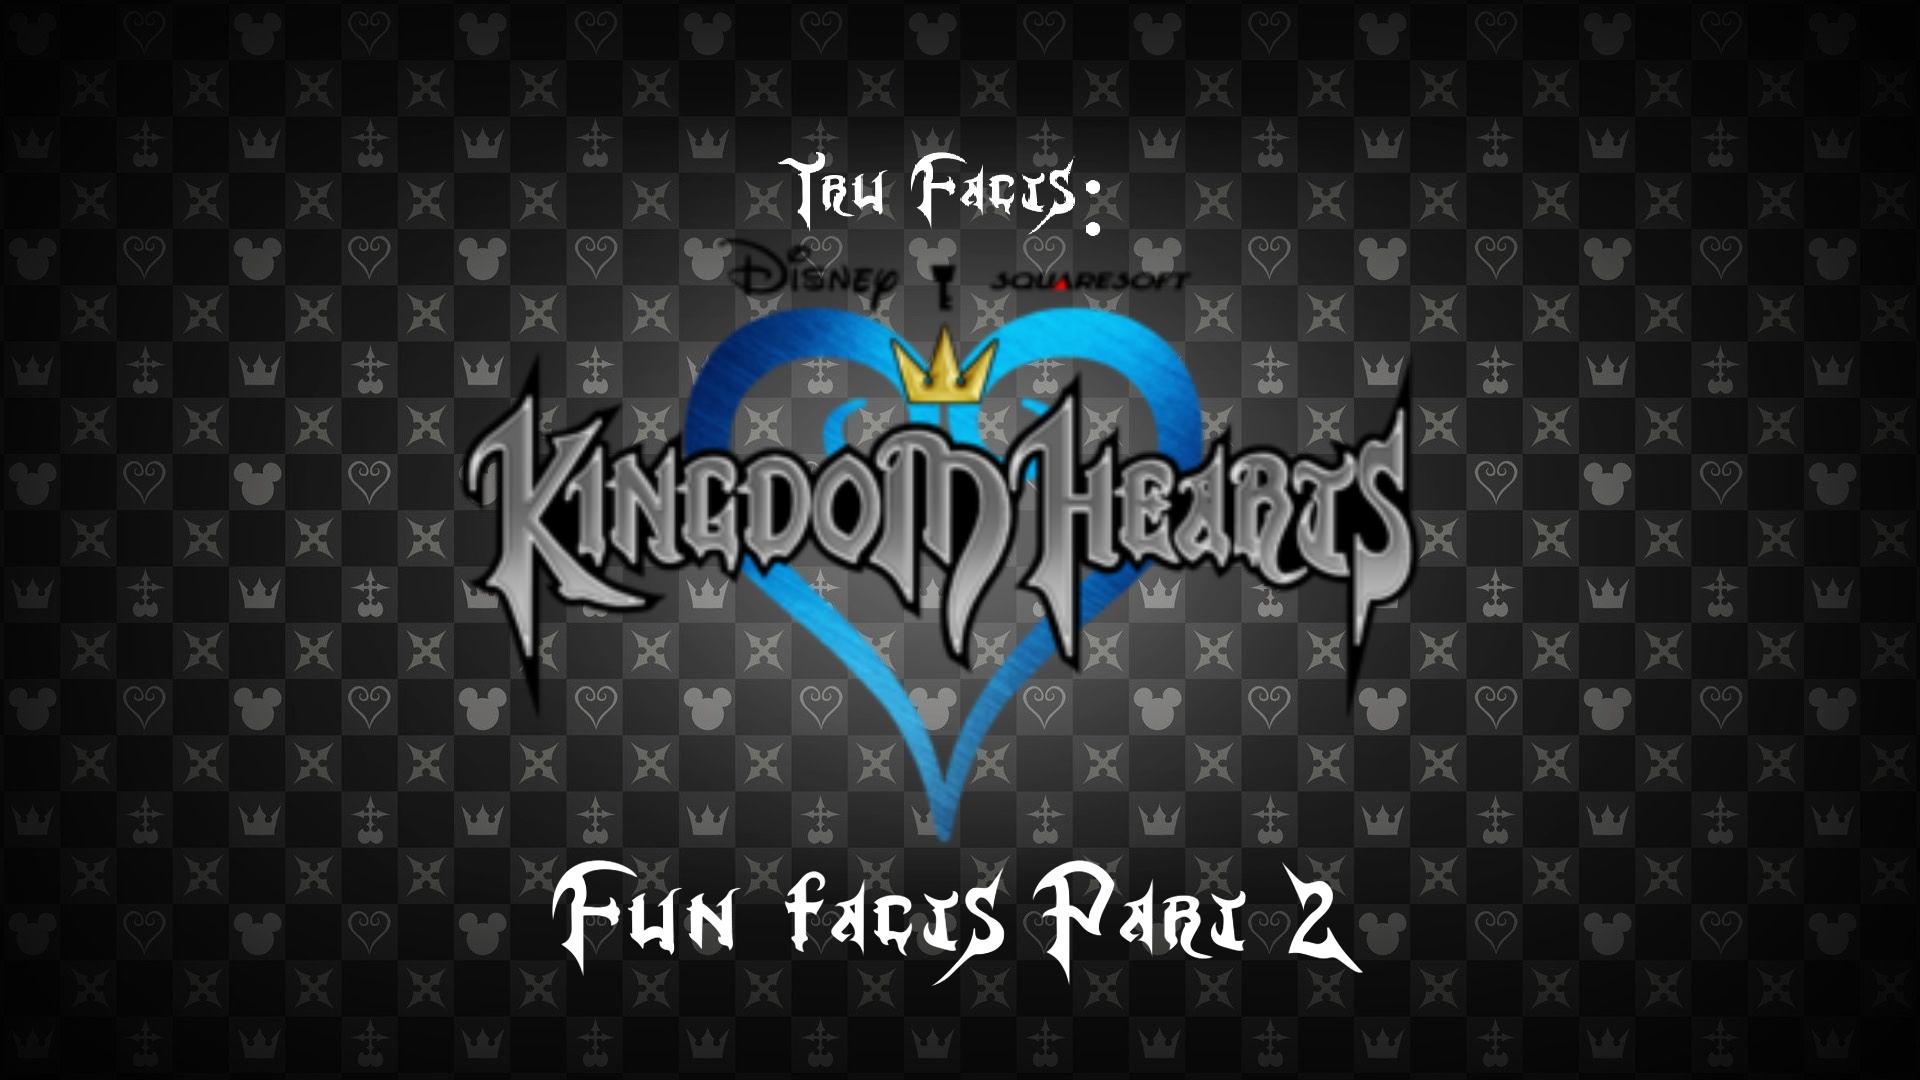 Tru Facts: Kingdom Hearts Fun Facts (Part 2)